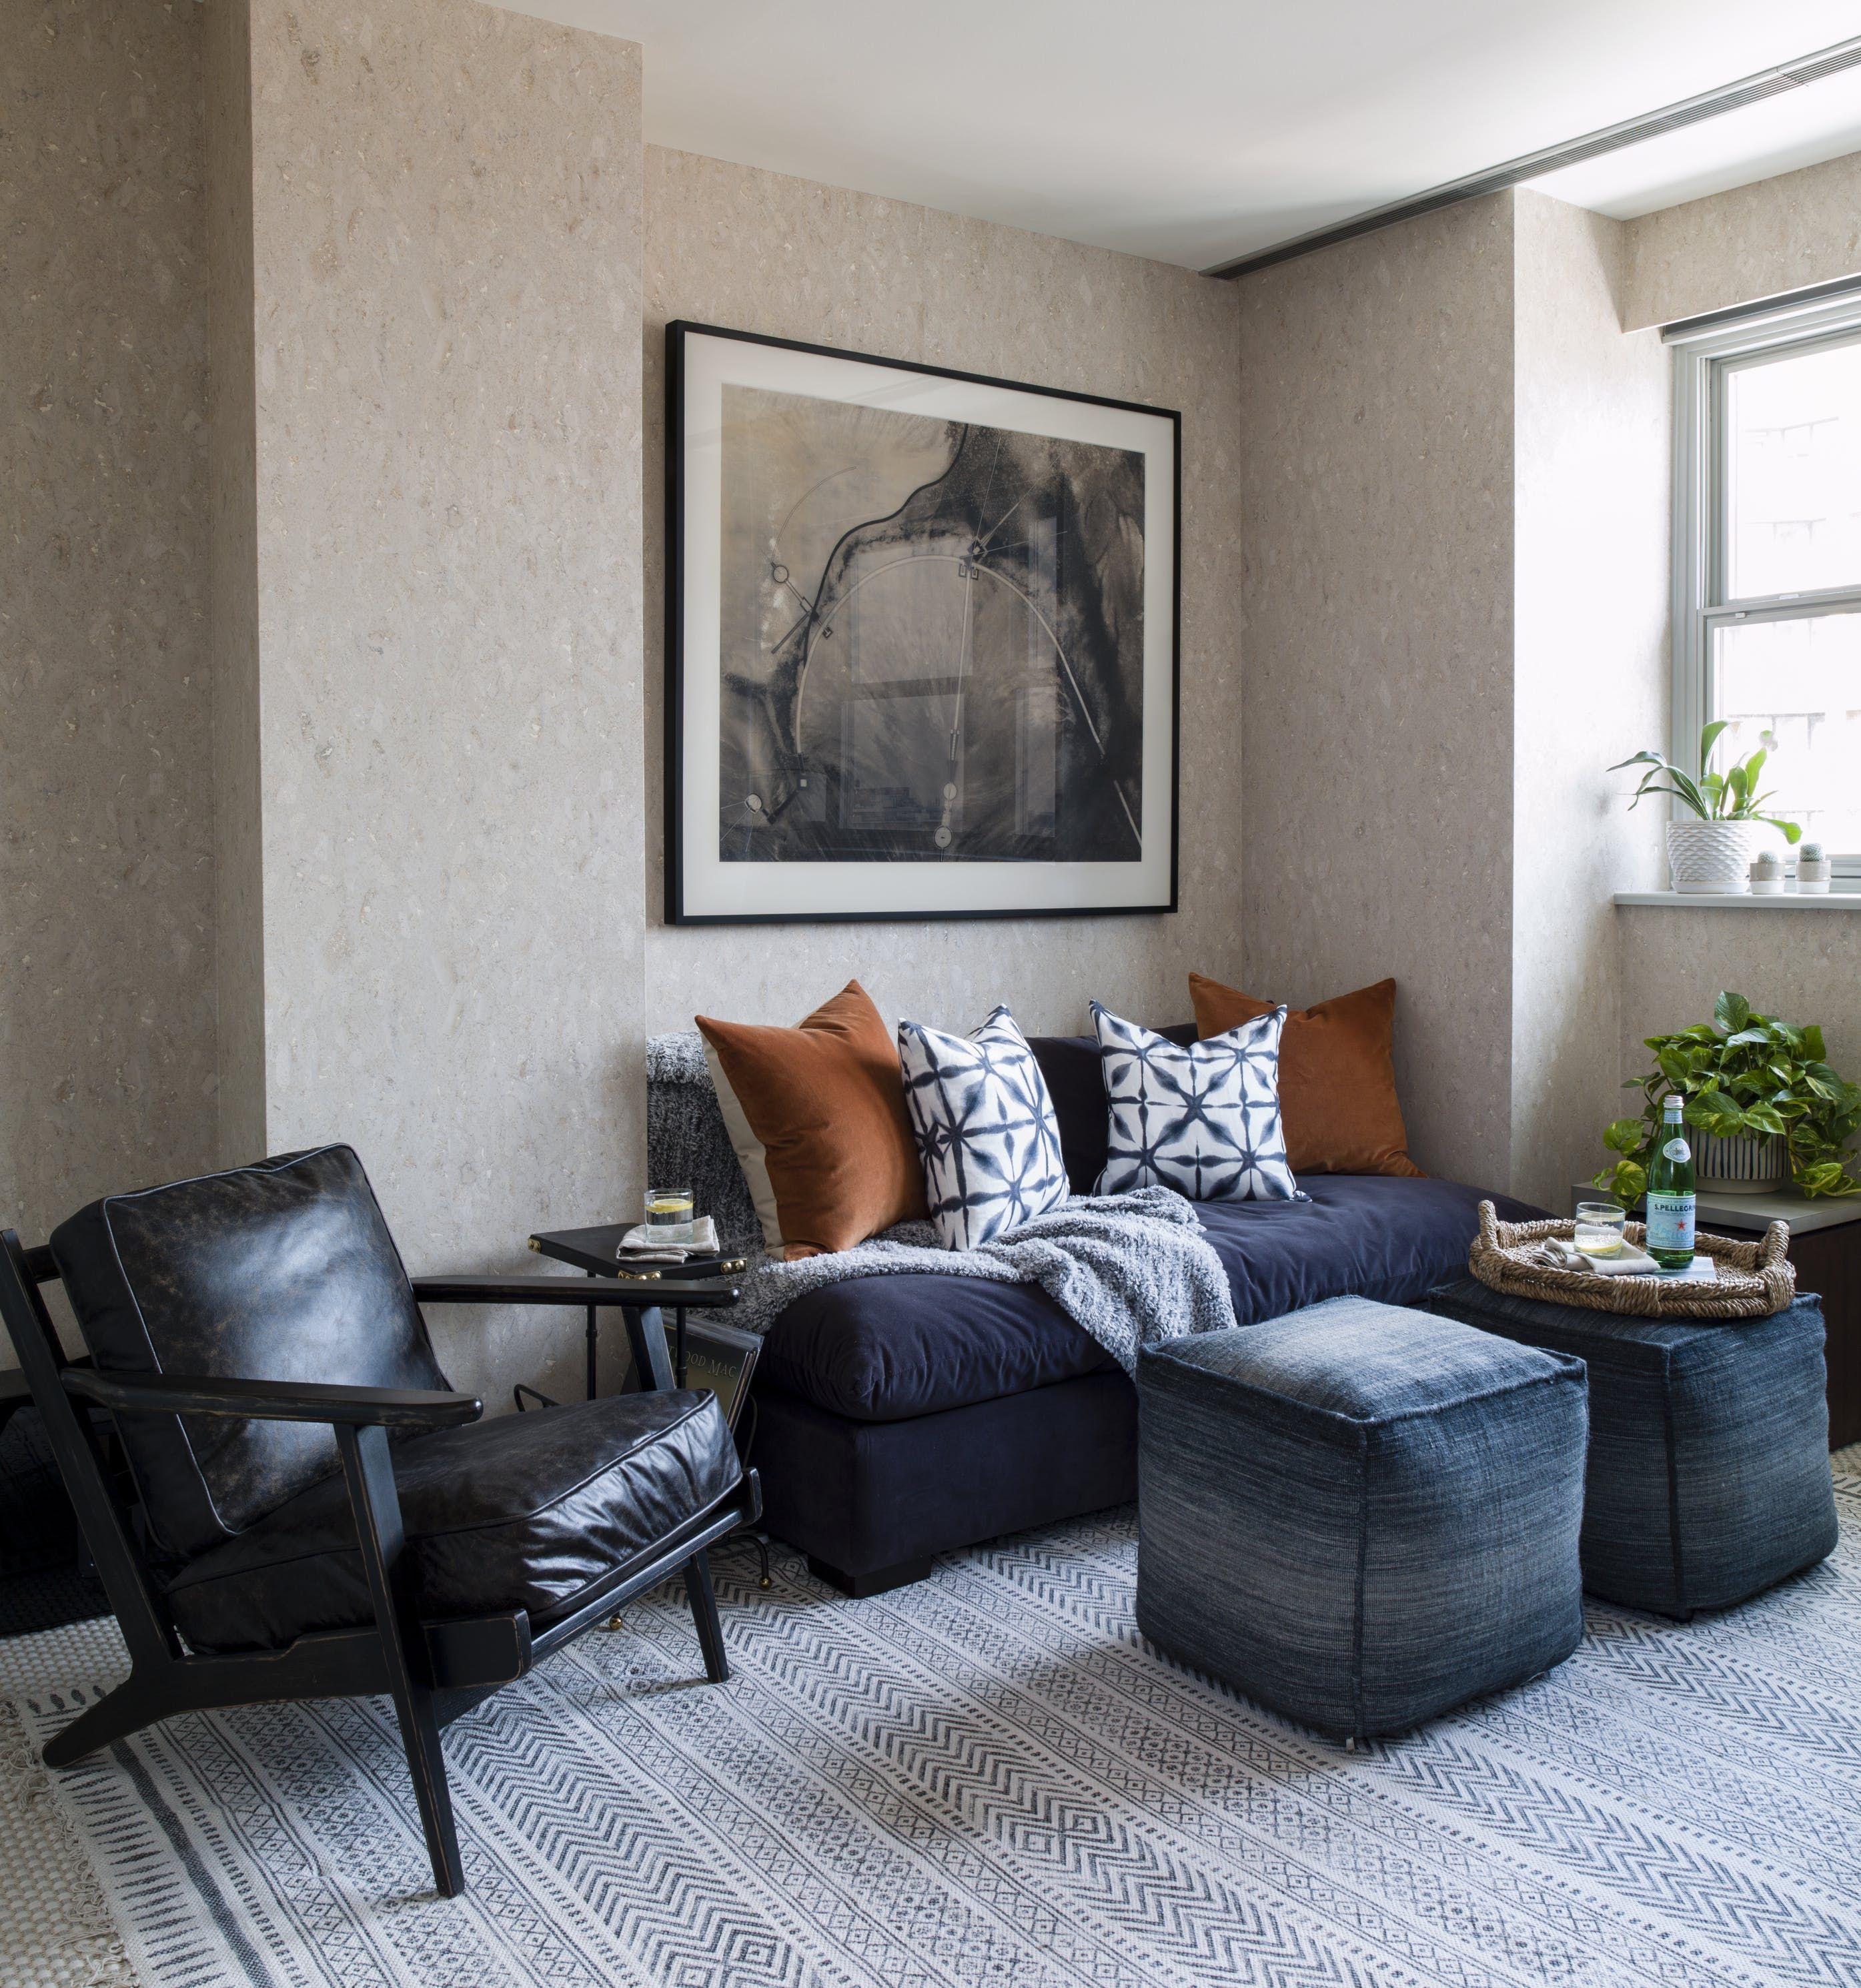 Chesapeake Residence Sitting Room With Cork Wallpaper